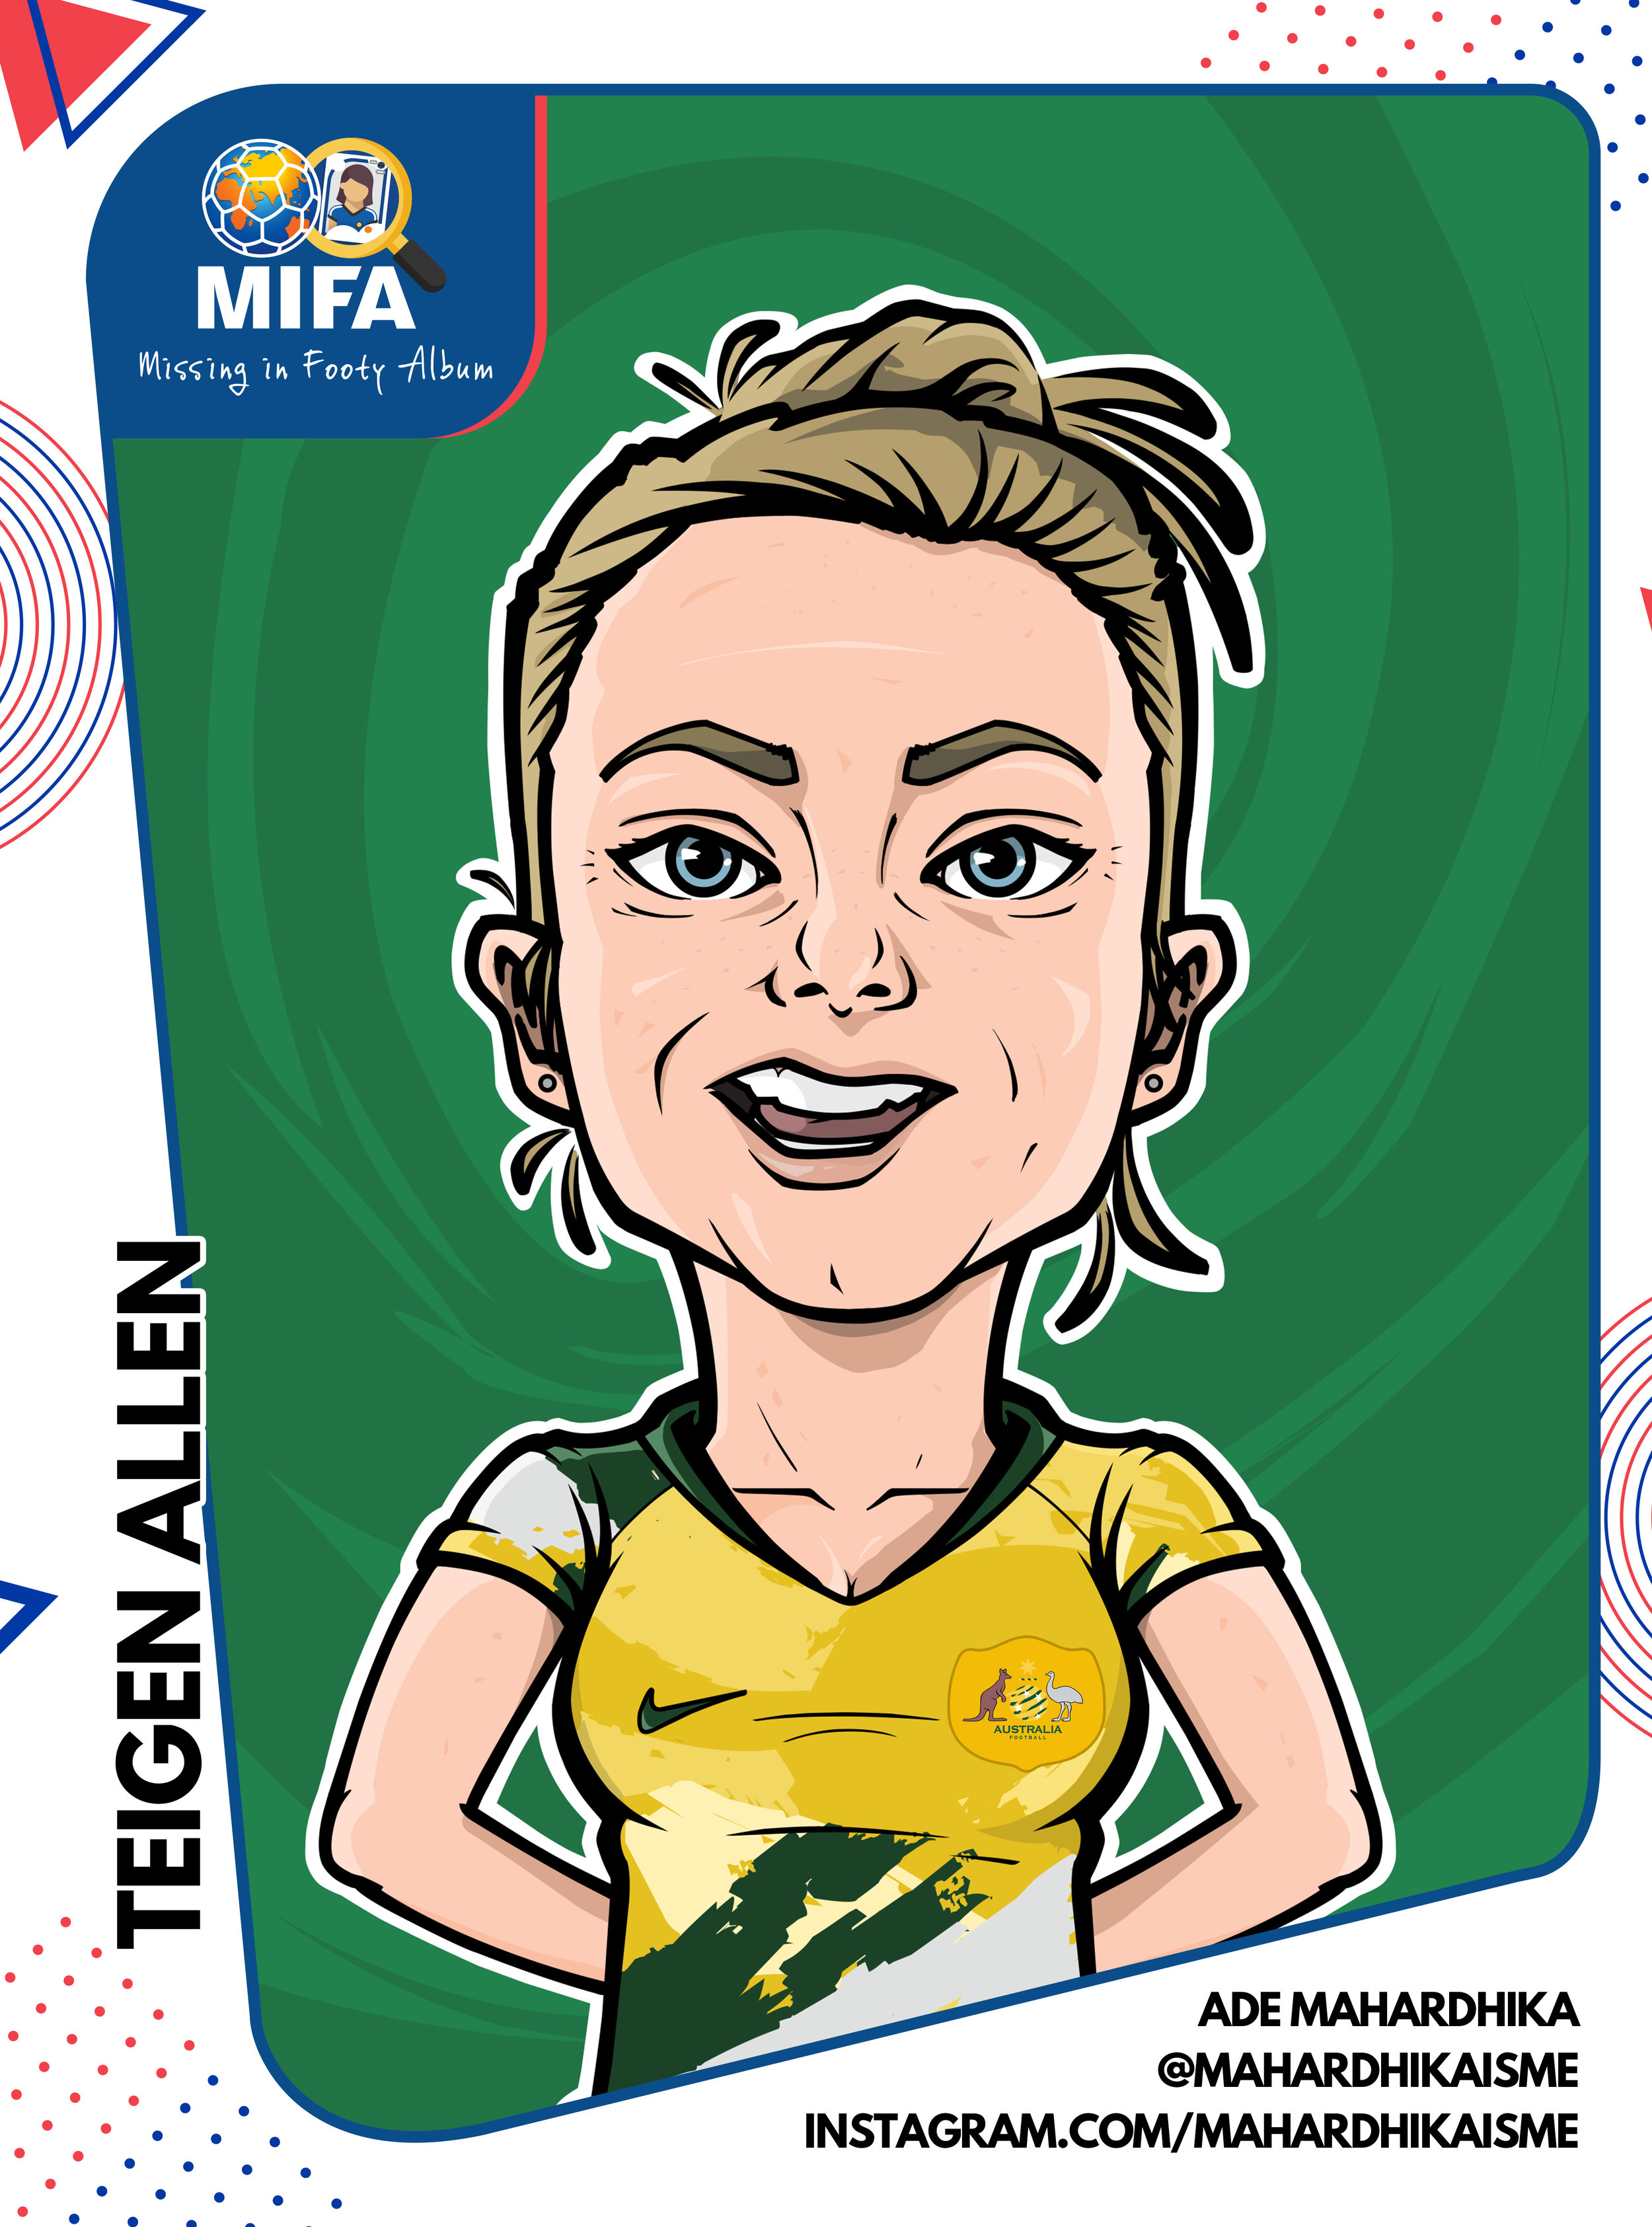 MIFA 2019 - Teigen Allen (Caricature).jpg